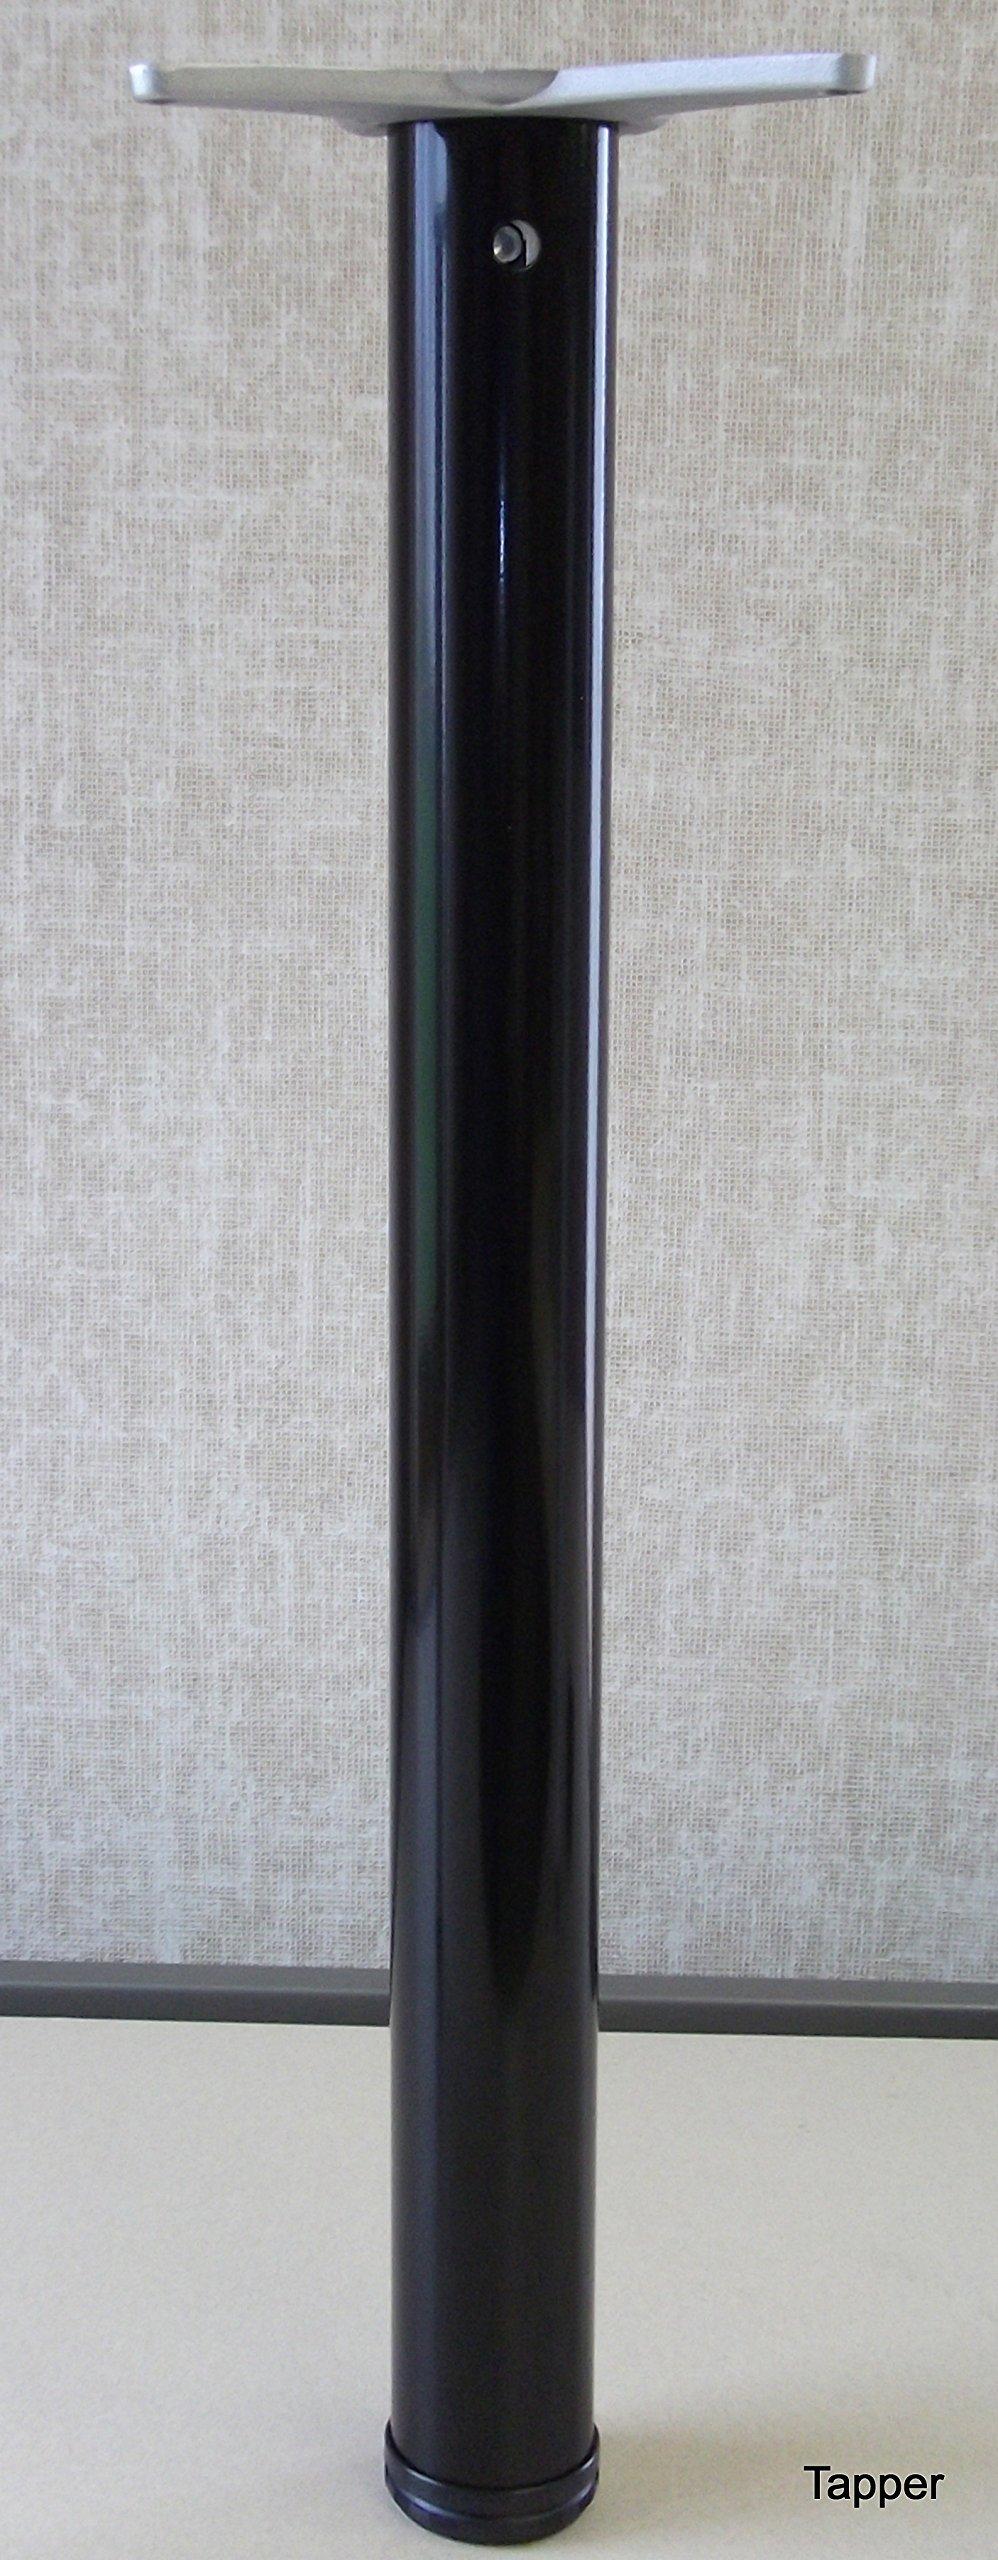 28'' Office Height Table Leg adjustable, 27.50'' to 28.75'', Black